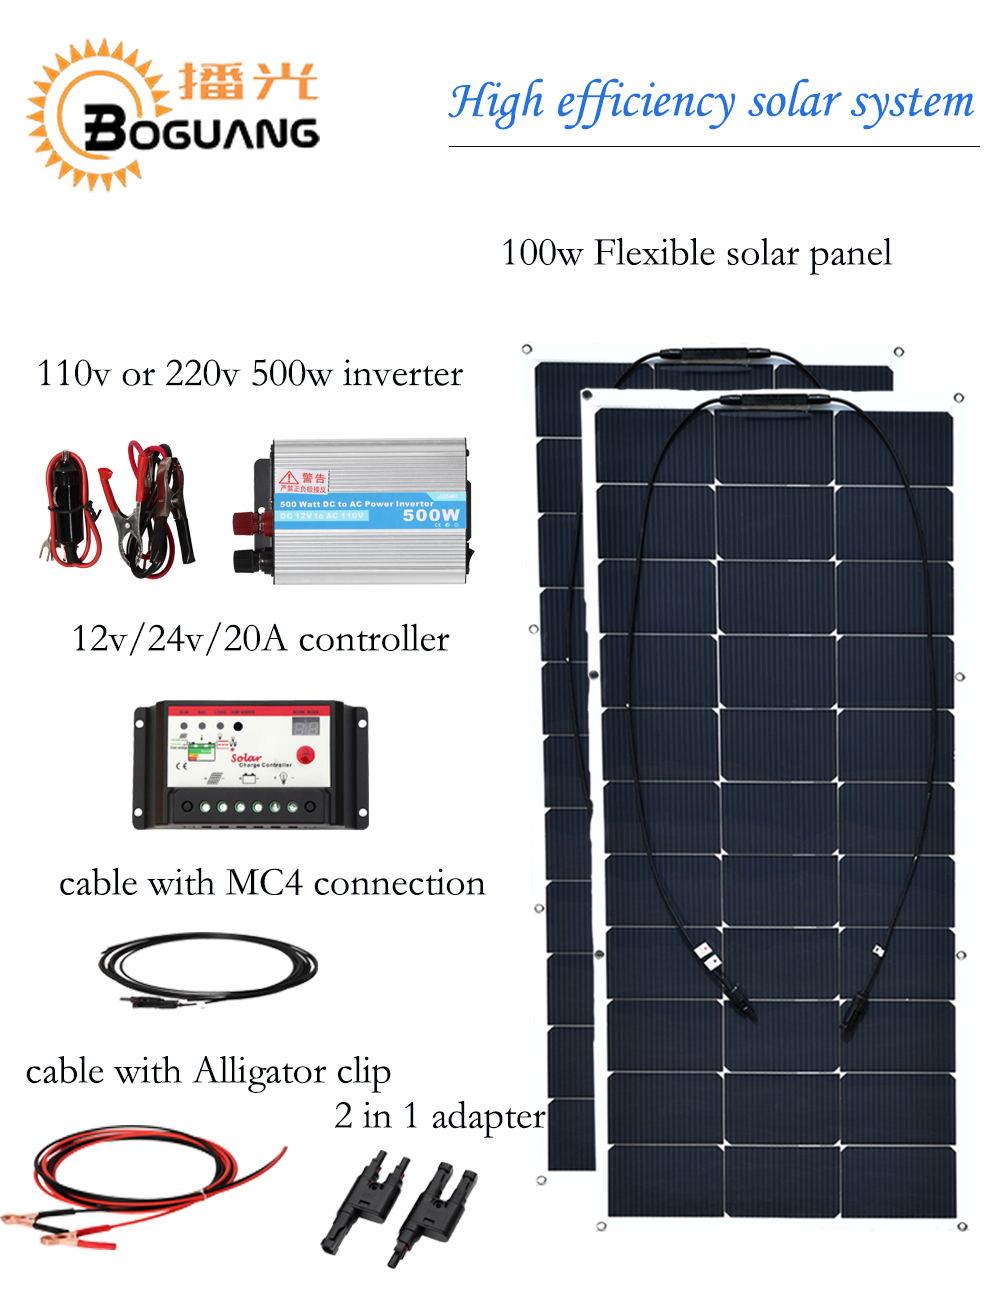 Boguang 200w solar system 100w flexible solar panel  module efficient cell 110v 220v 500w inverter 12v/24v 20A controller cable boguang 500w semi flexible solar panel solar system efficient cell diy kit module 50a mppt controller adapter mc4 connector